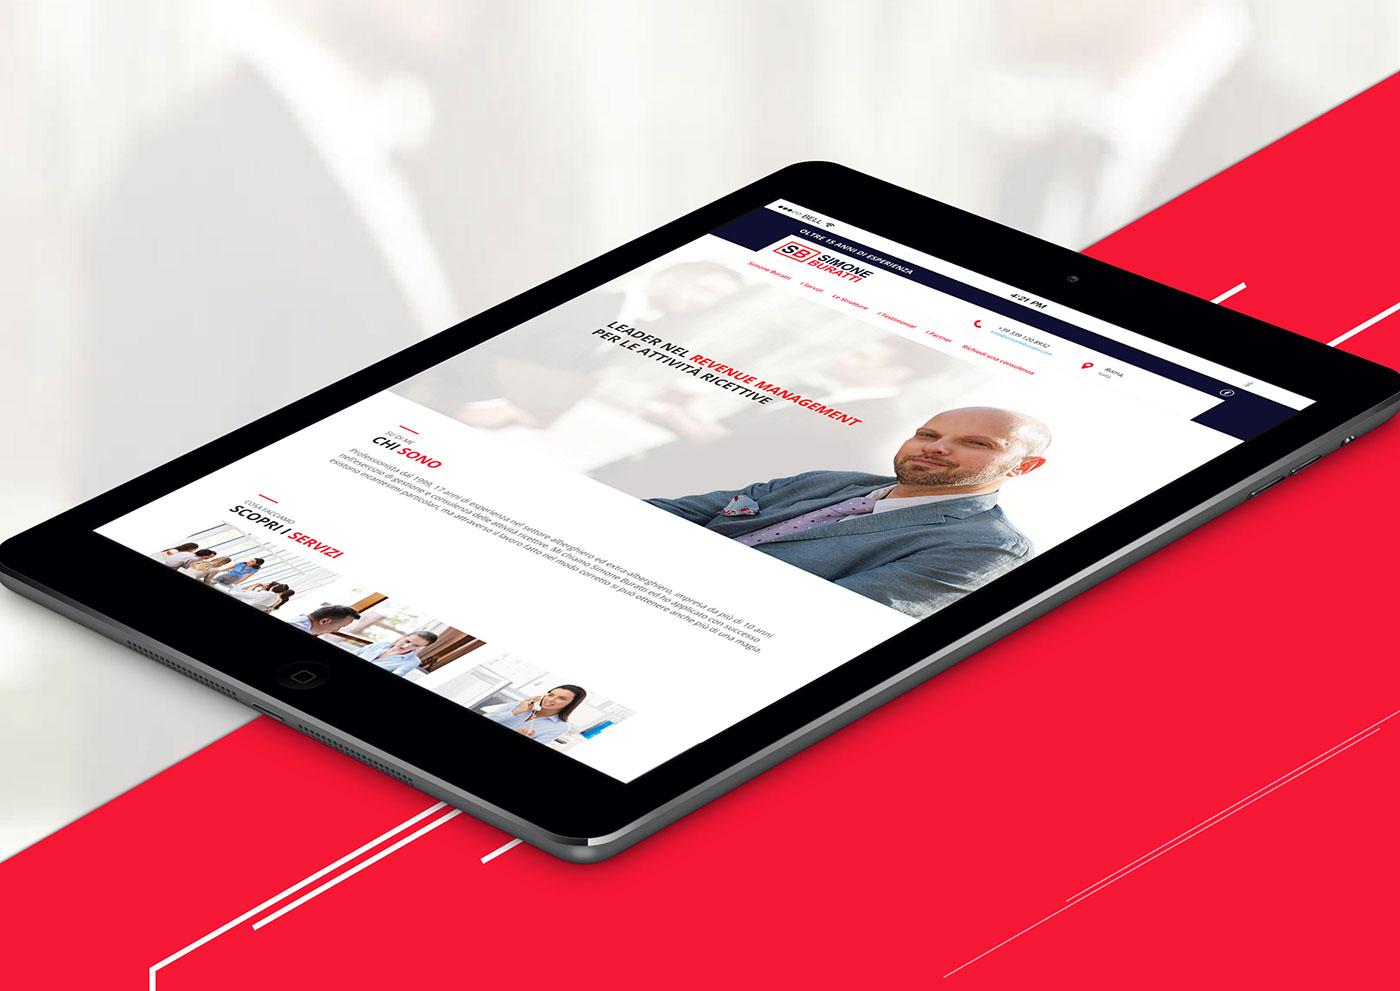 Revenue Management,Simone Buratti,Website,inspire,inspiration,geometric,UI/UX,business,Web Design ,branding